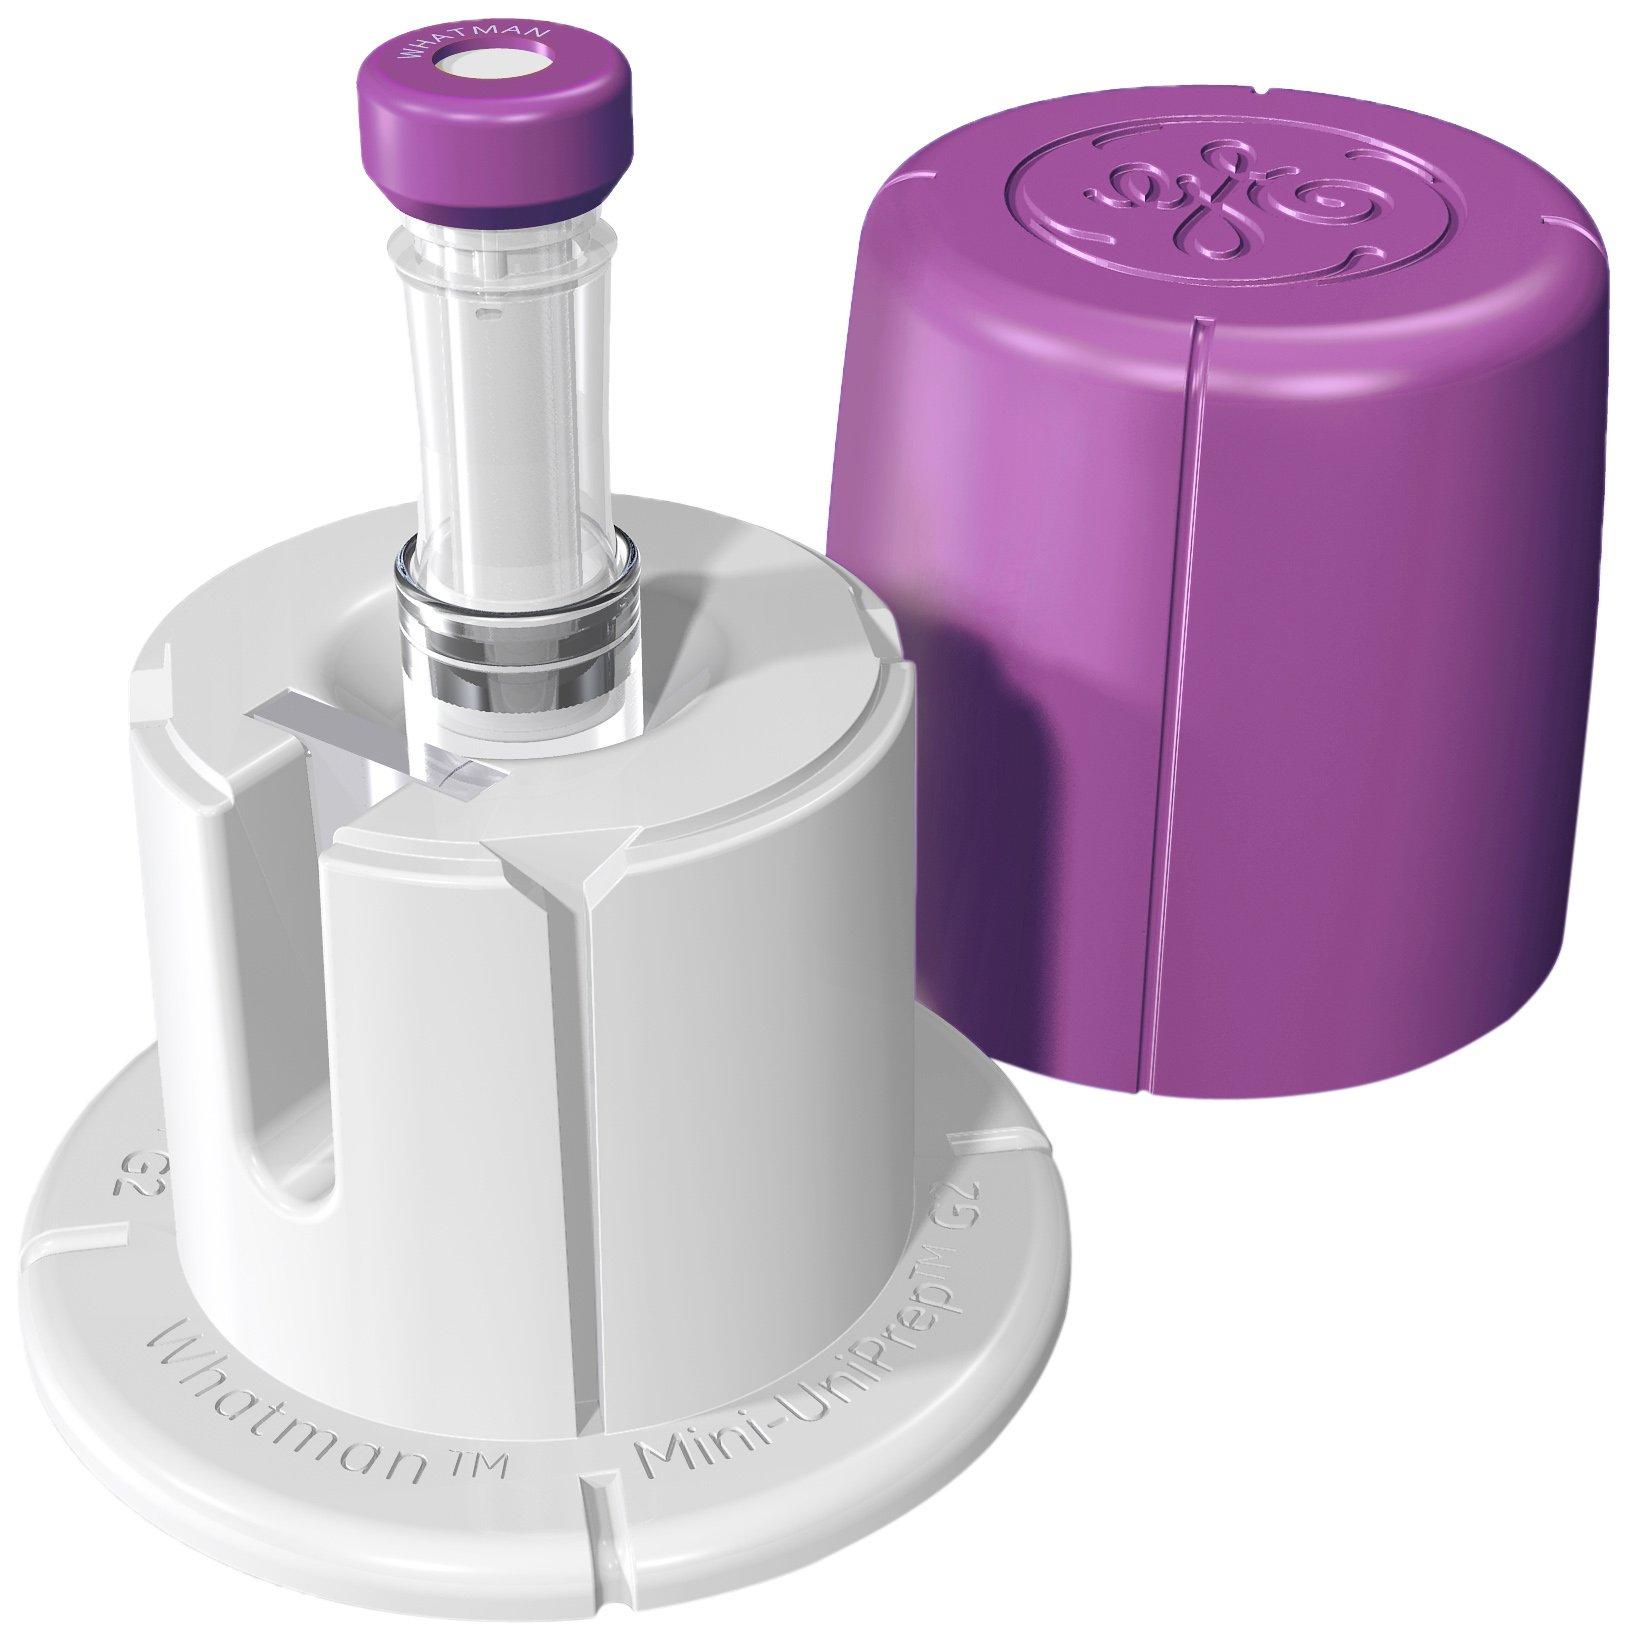 Whatman MUPG2HCPWC1 Mini-UniPrep G2 Plastic Hand Compressor, Plastic That Will Compress 1 MUP-G2 Unit